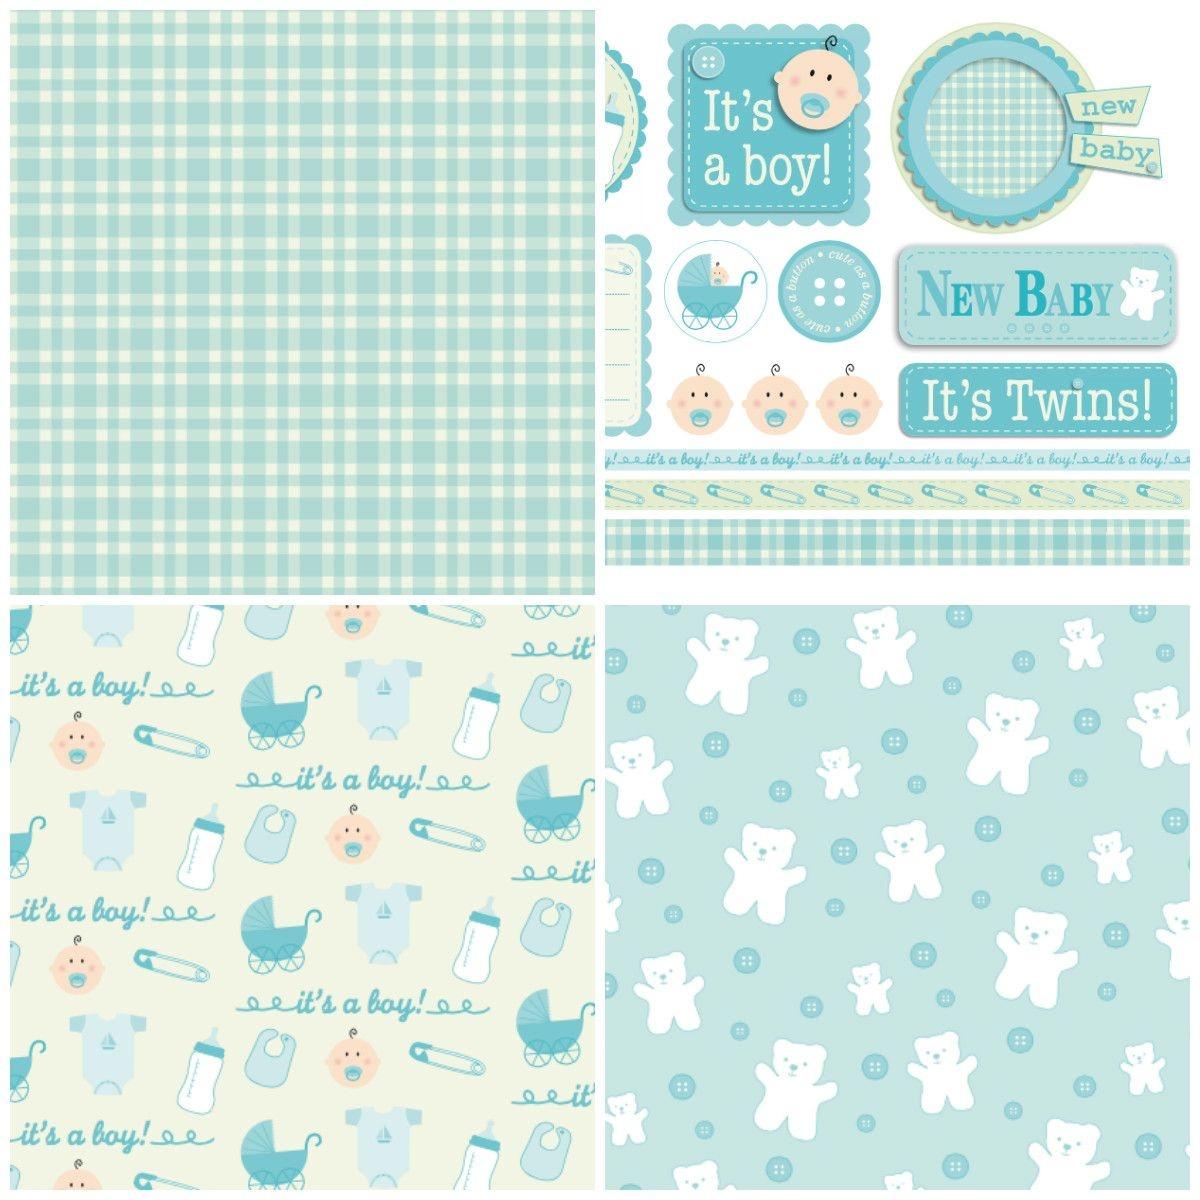 Handmade For Babies – Free Papers | Printable Papers | Digital Paper - Free Printable Scrapbook Stuff